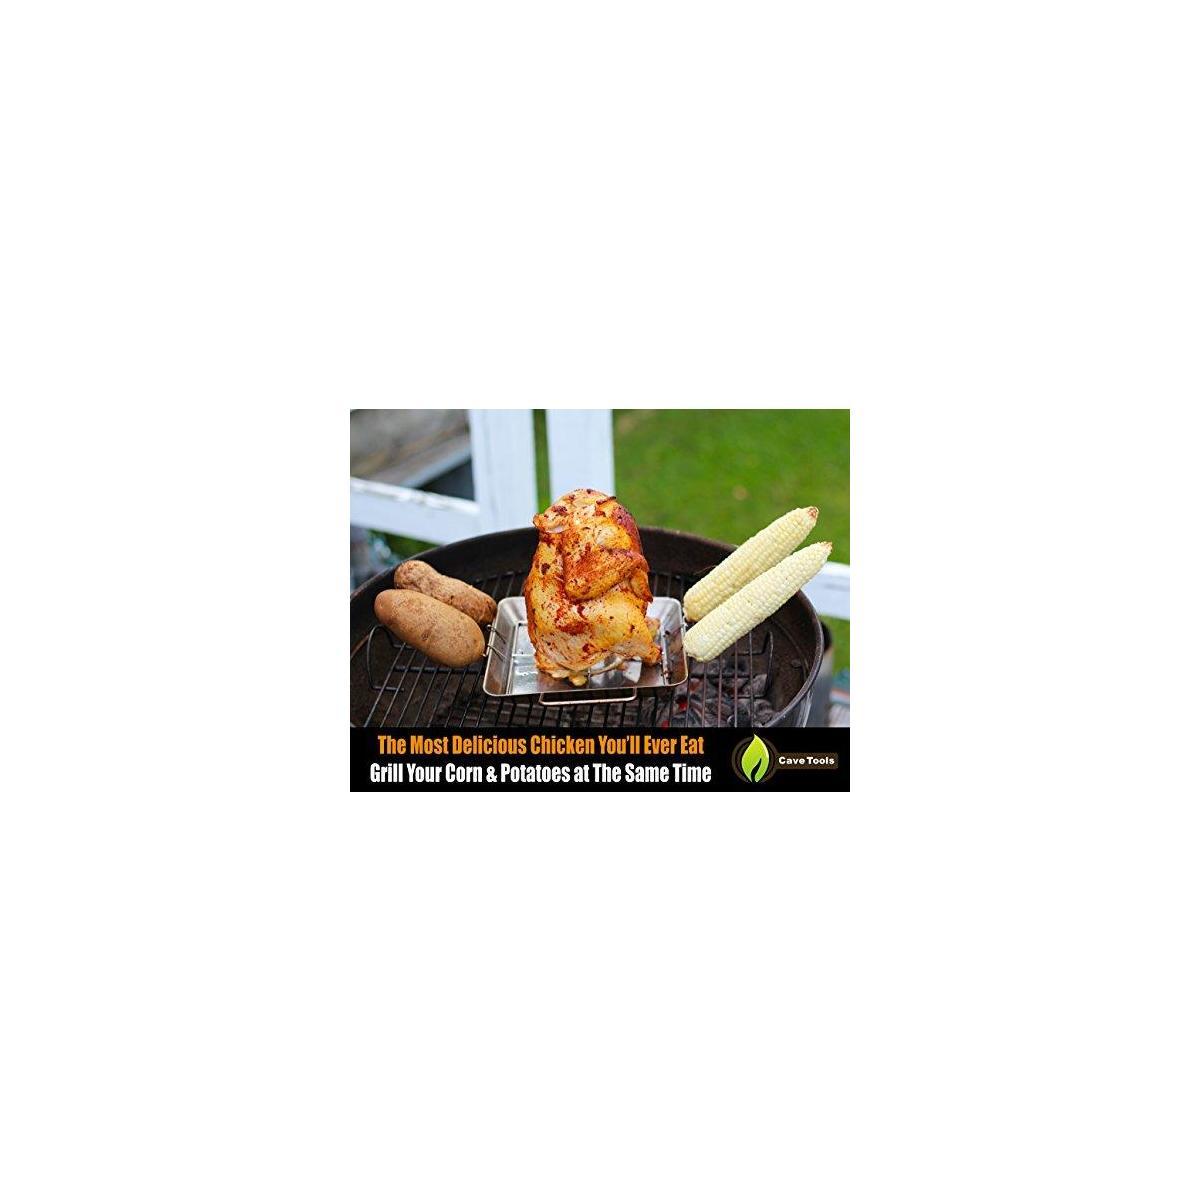 Beer Can Chicken Holder Rack + Pulled Pork Shredder Claws - Strongest BBQ Meat Forks - Shredding Handling & Carving Food - Claw Handler Set for Pulling Brisket from Grill Smoker or Slow Cooker